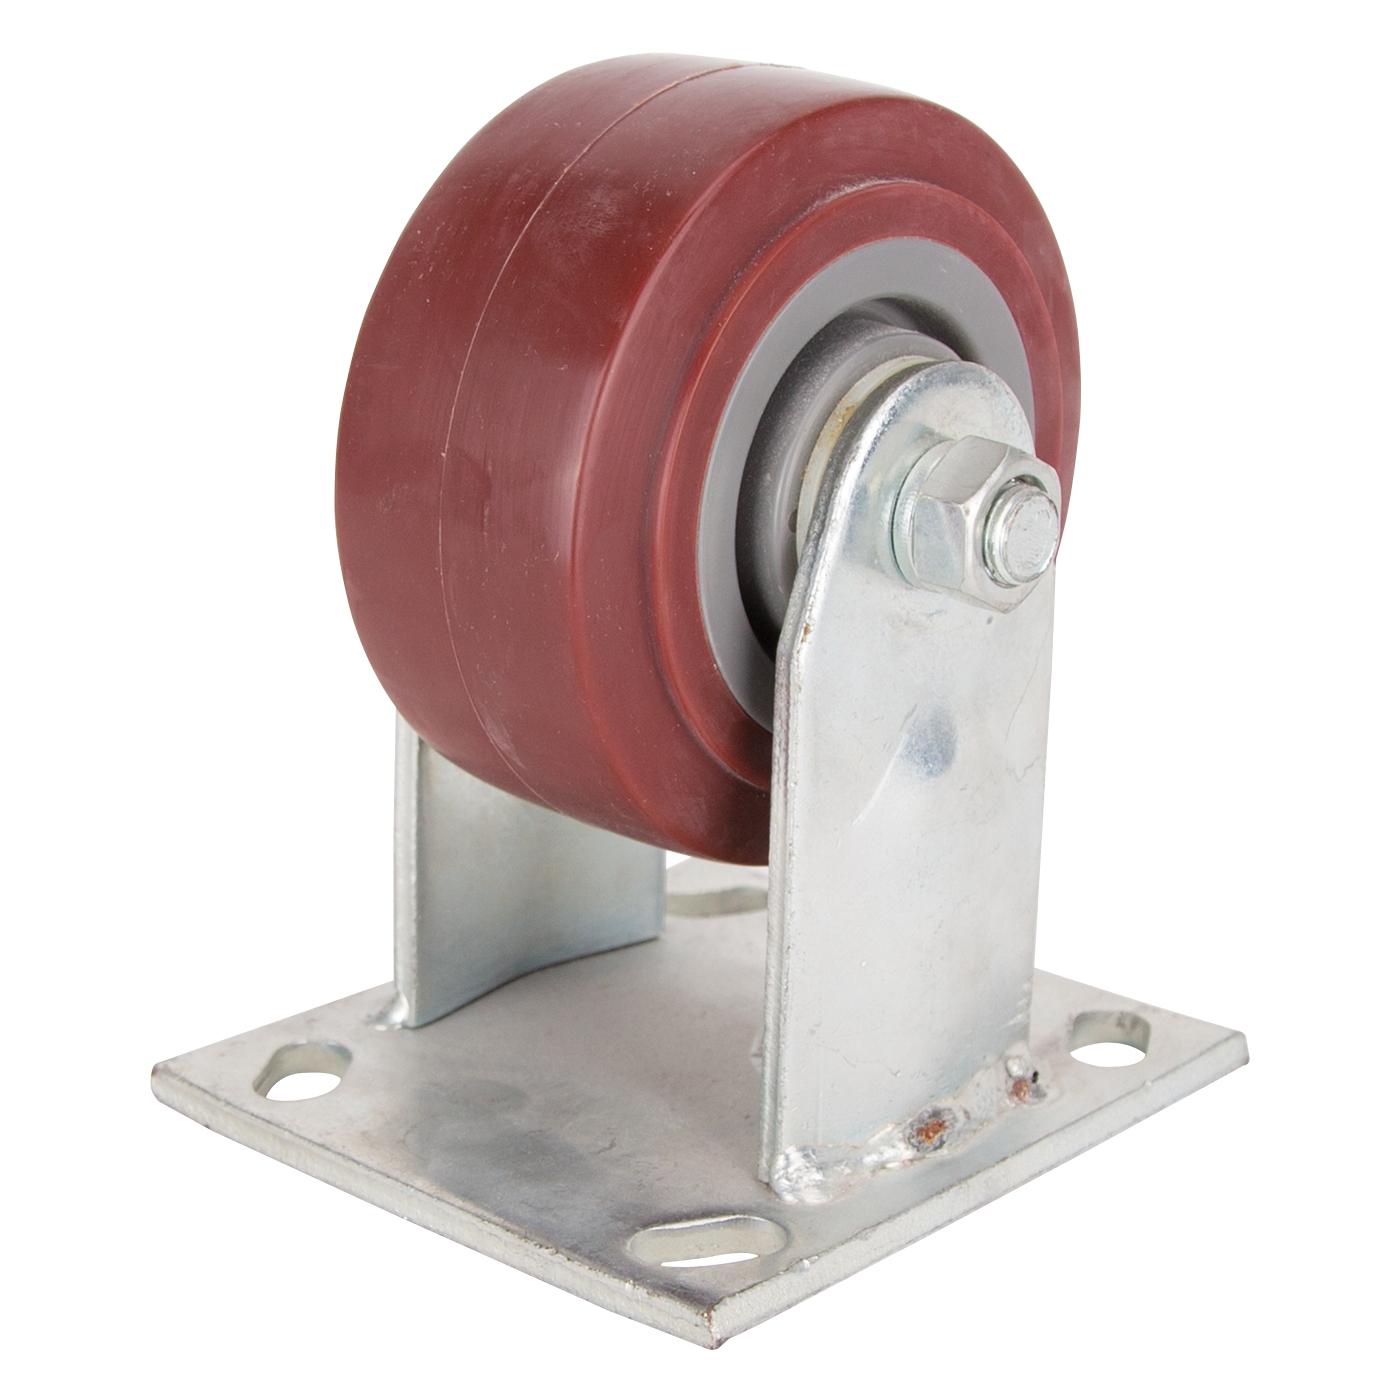 Picture of ProSource JC-P01 Rigid Caster, 4 in Dia Wheel, 2 in W Wheel, Polyurethane Wheel, 350 lb